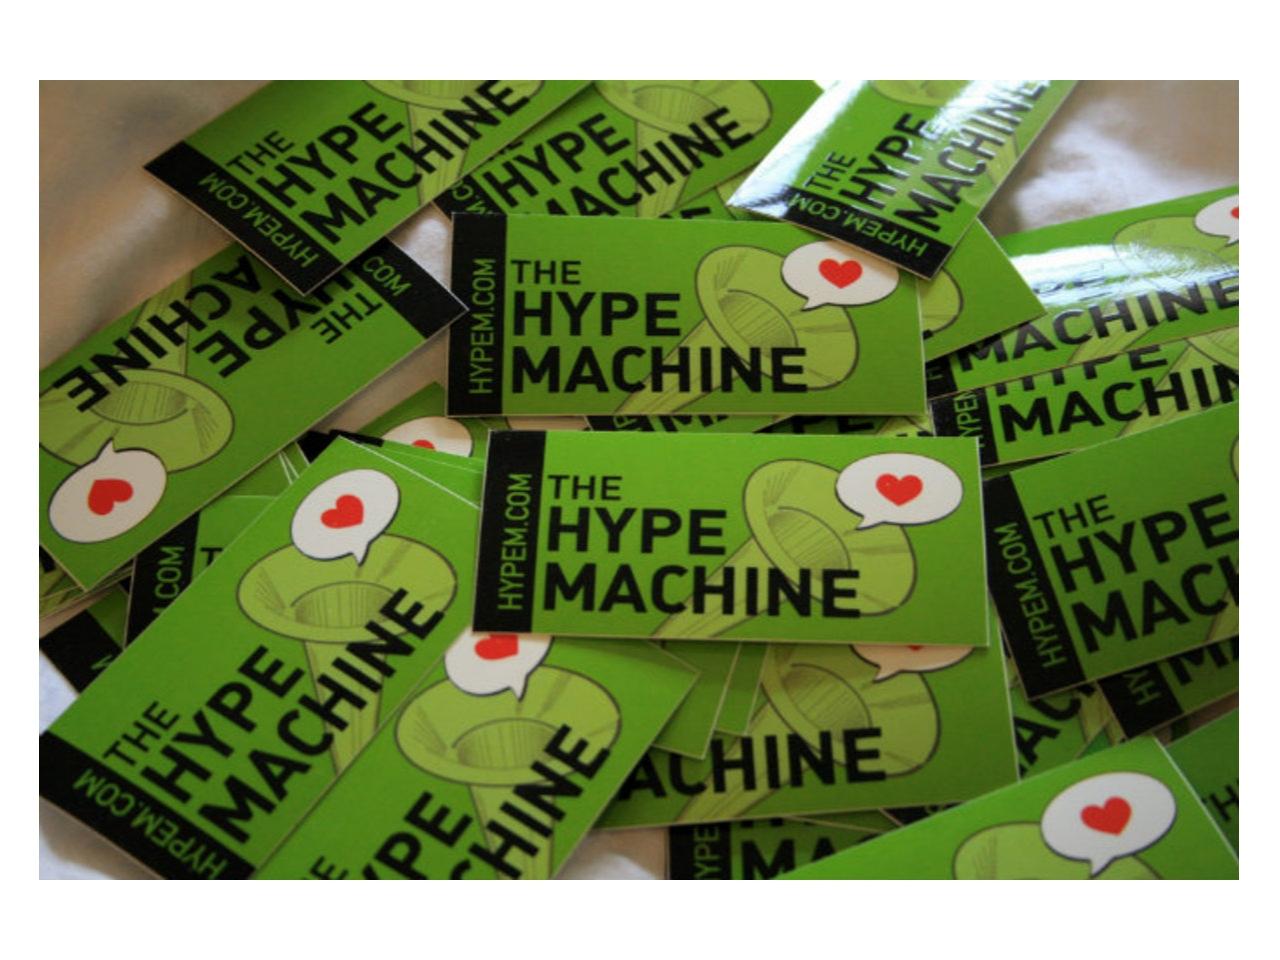 hype-machine-mp3-blog-index